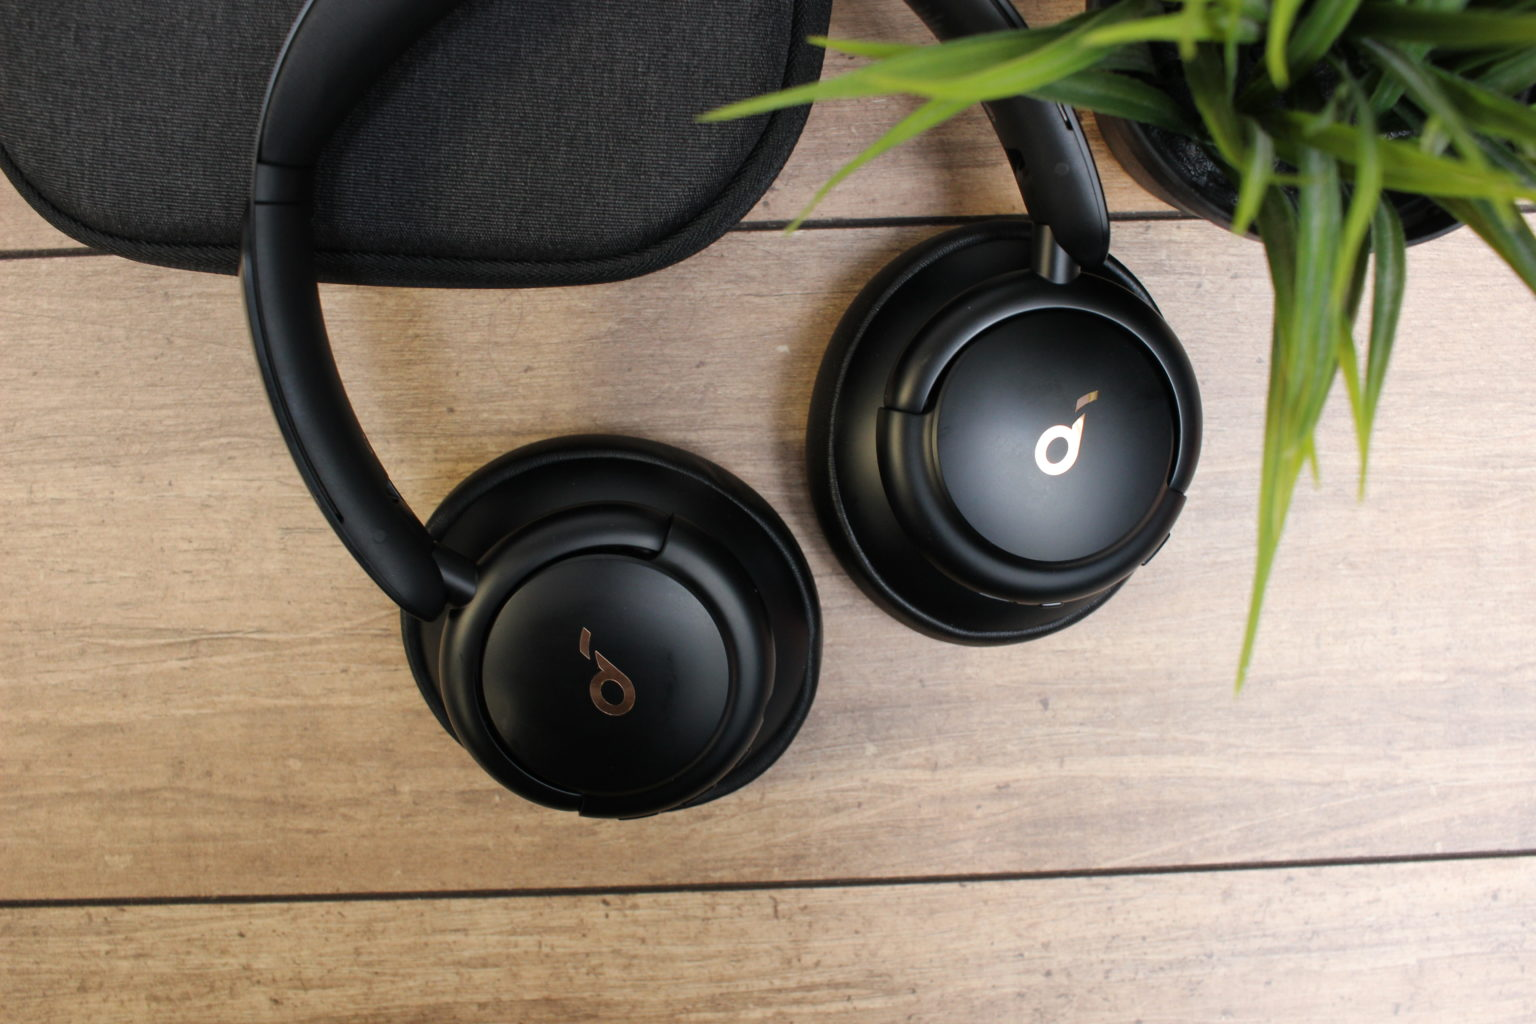 Diseño de los auriculares bluetooth over-ear Soundcore Life Q30